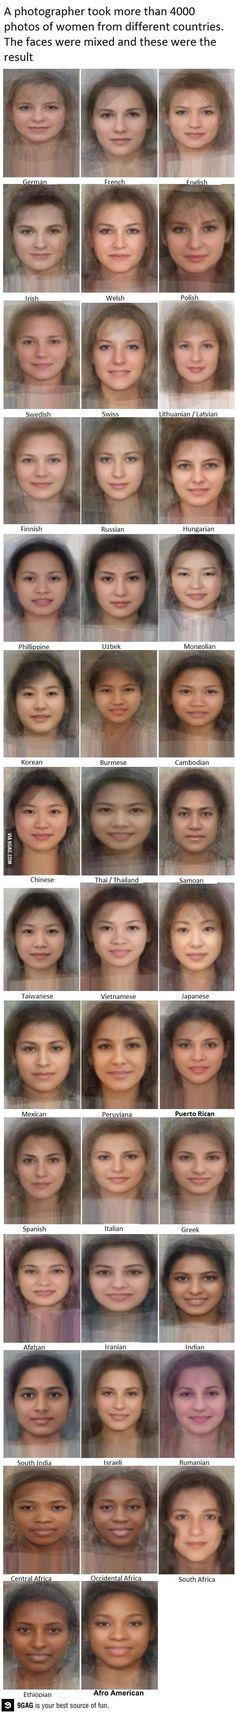 Average face from women from different countries Non è incredibile come siano TUTTE belle?